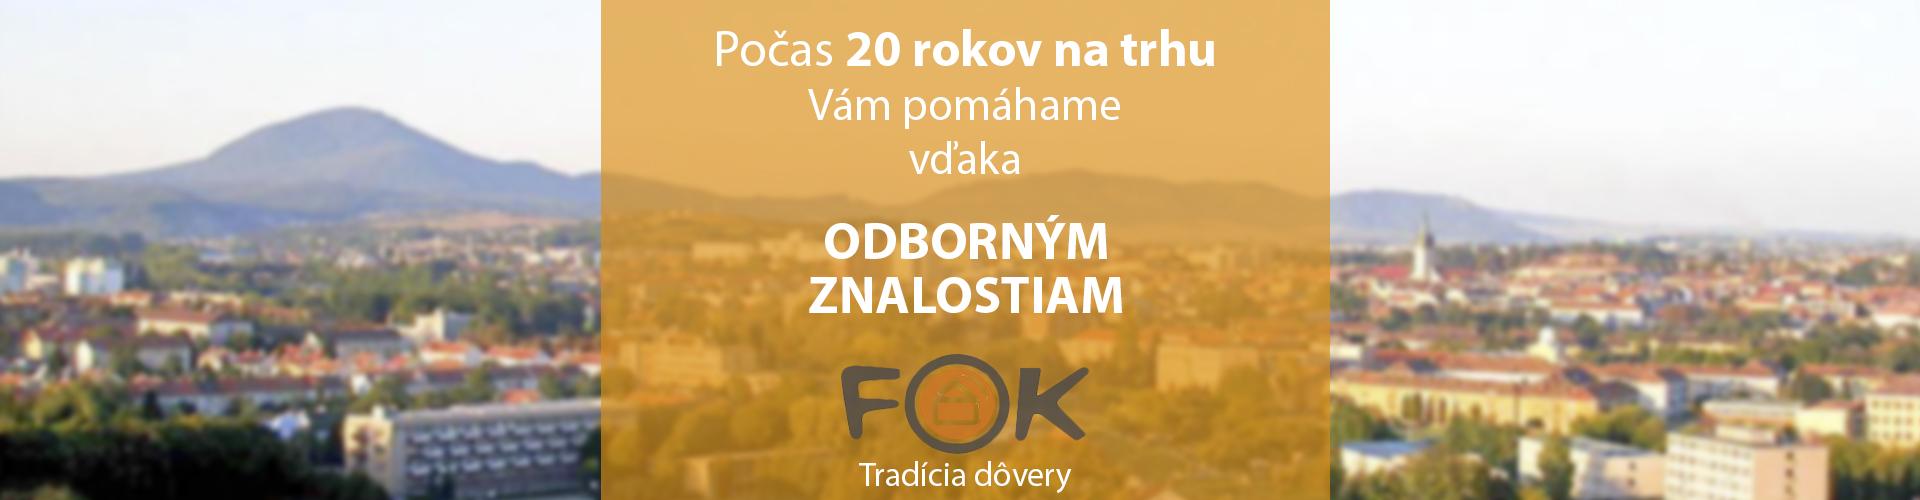 FOK_Reality3